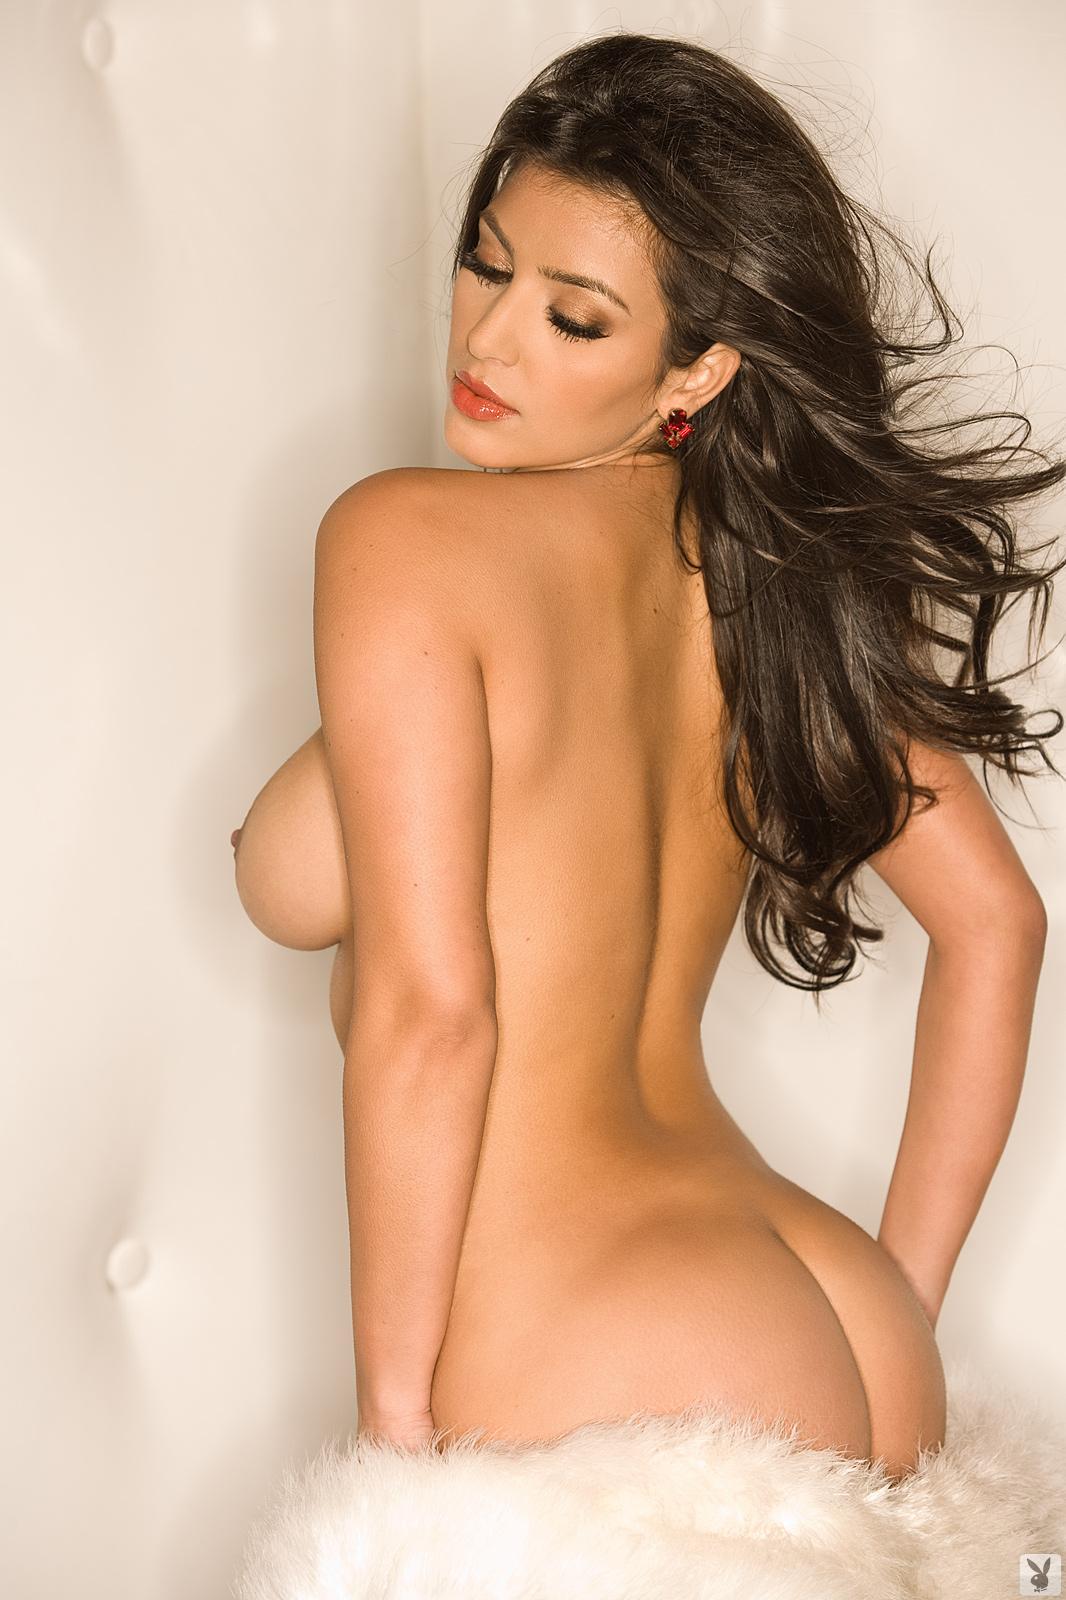 Kim Kardashian Nude Playboy Photoshoot Leaked Dilicp